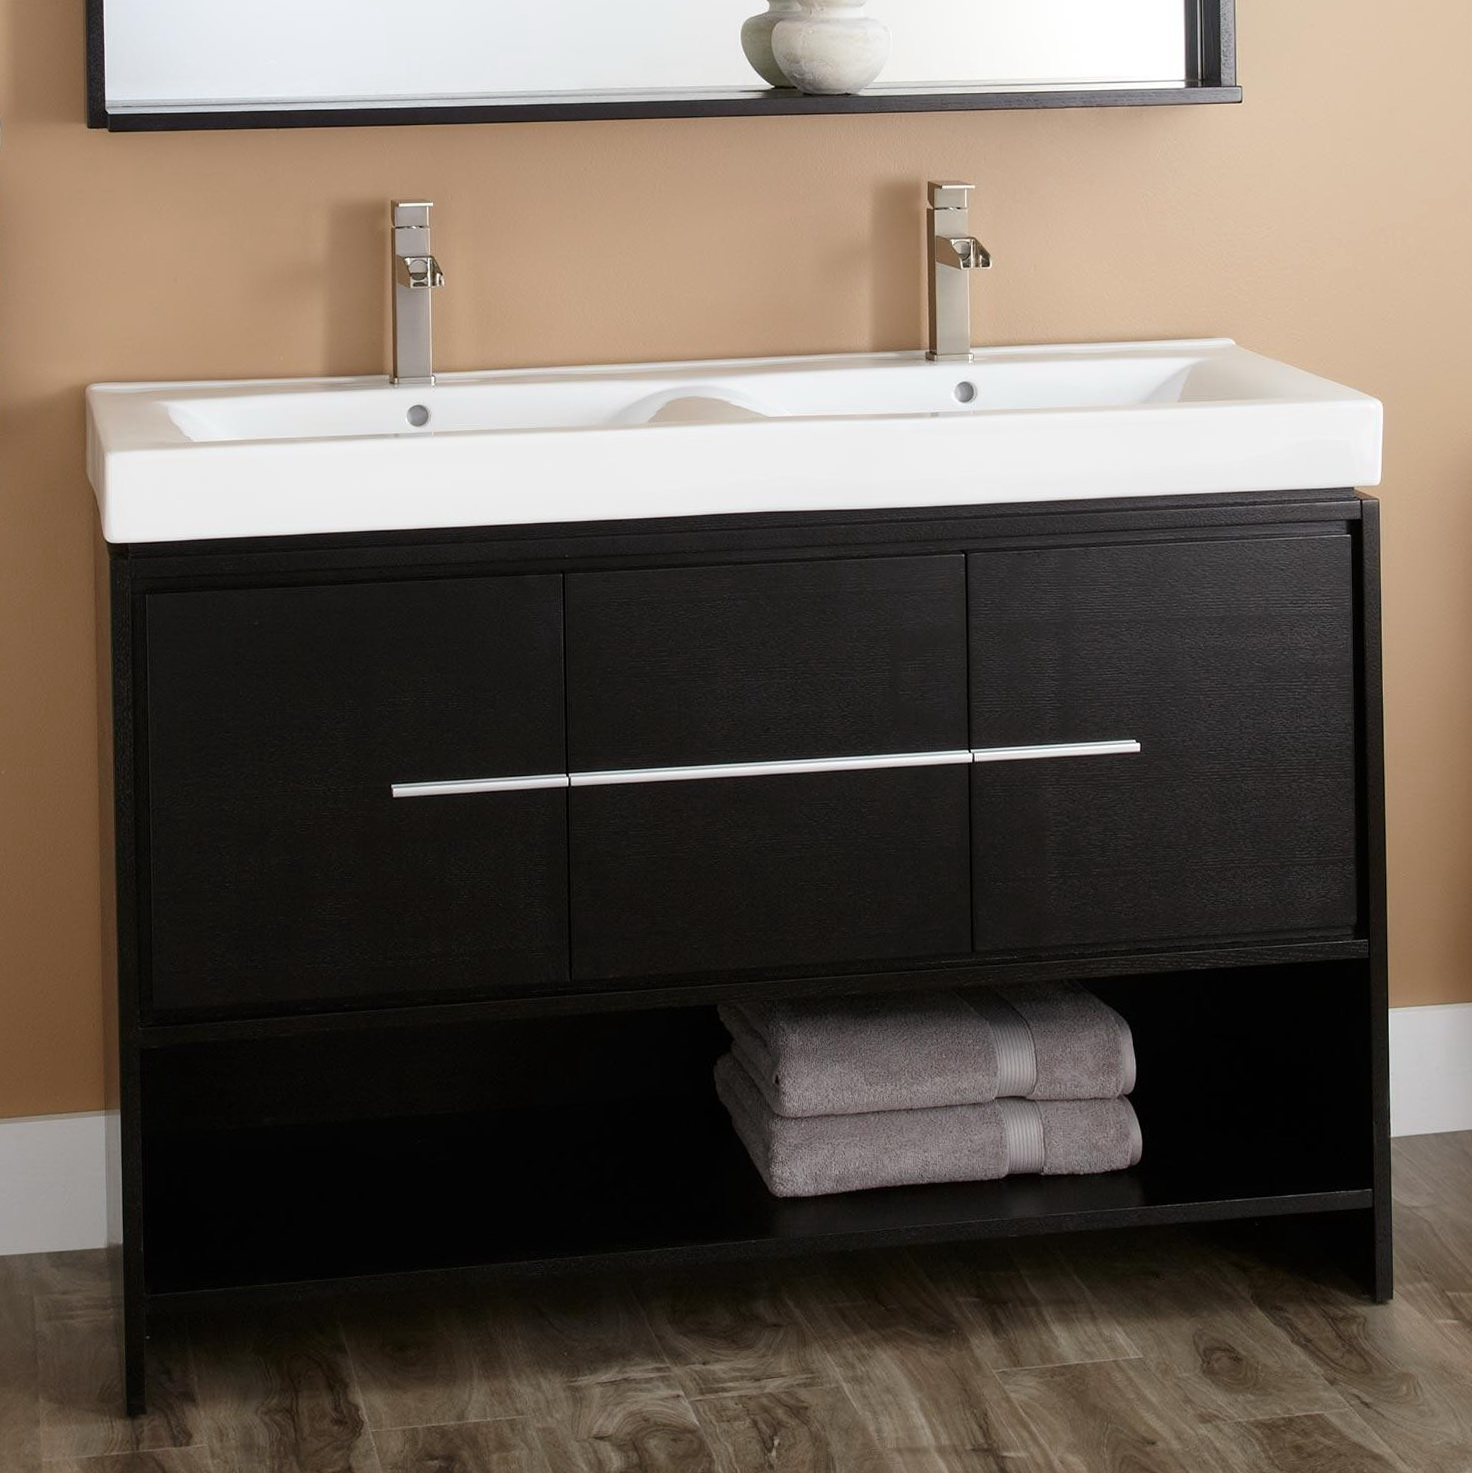 48 Inch Double Vanity Cabinet